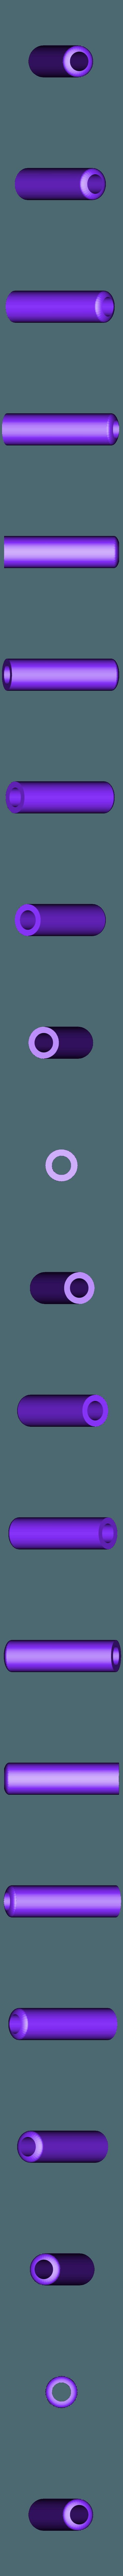 silencerdummy_weaver_v2.stl Download free STL file Triple Weaver Rail with Silencer Dummy • 3D printable model, vmi